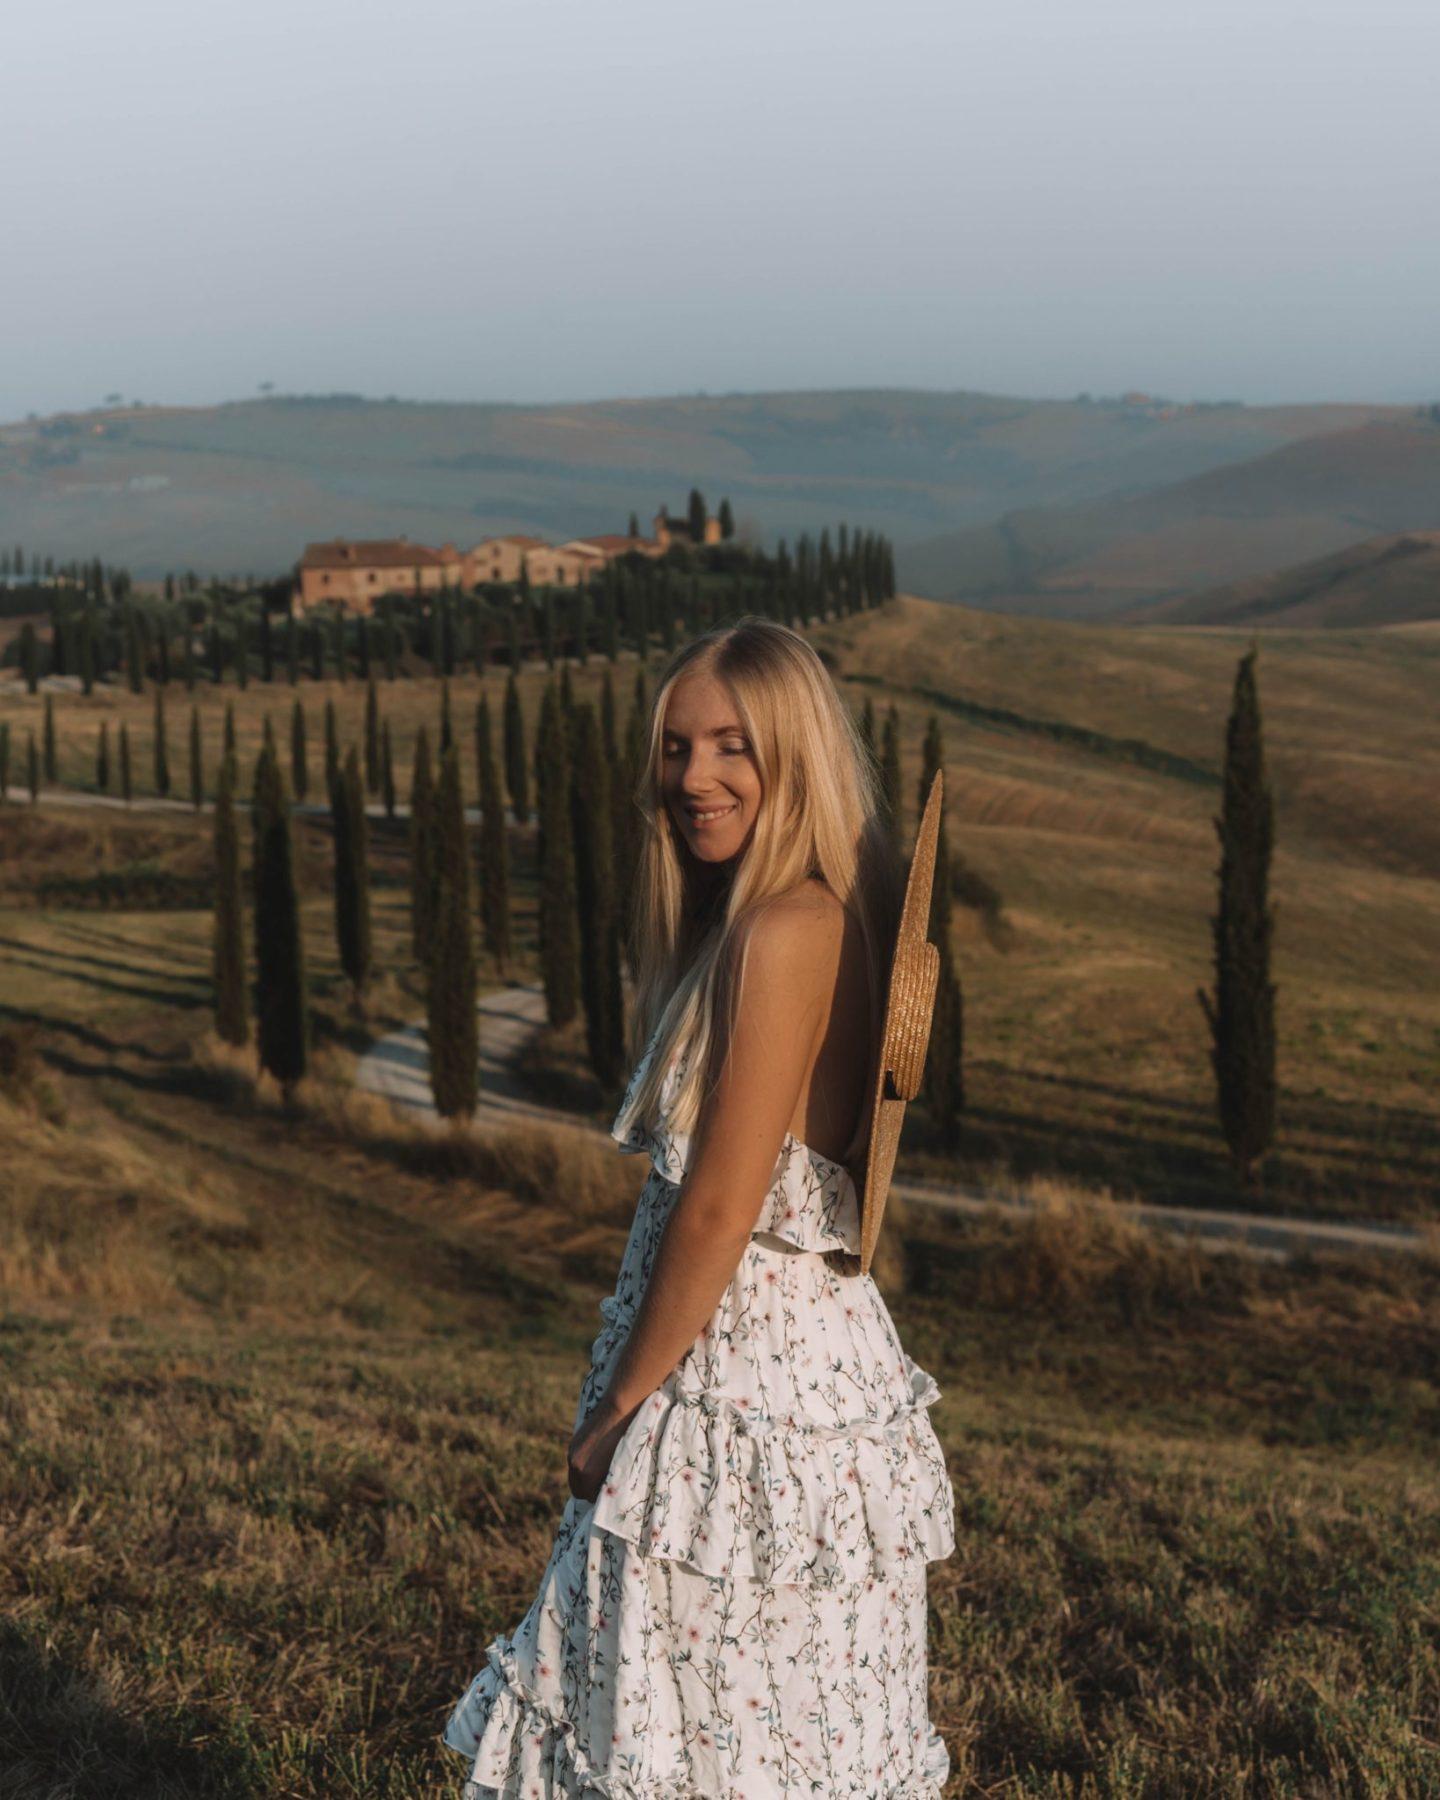 Toscane Italie Idée de voyage